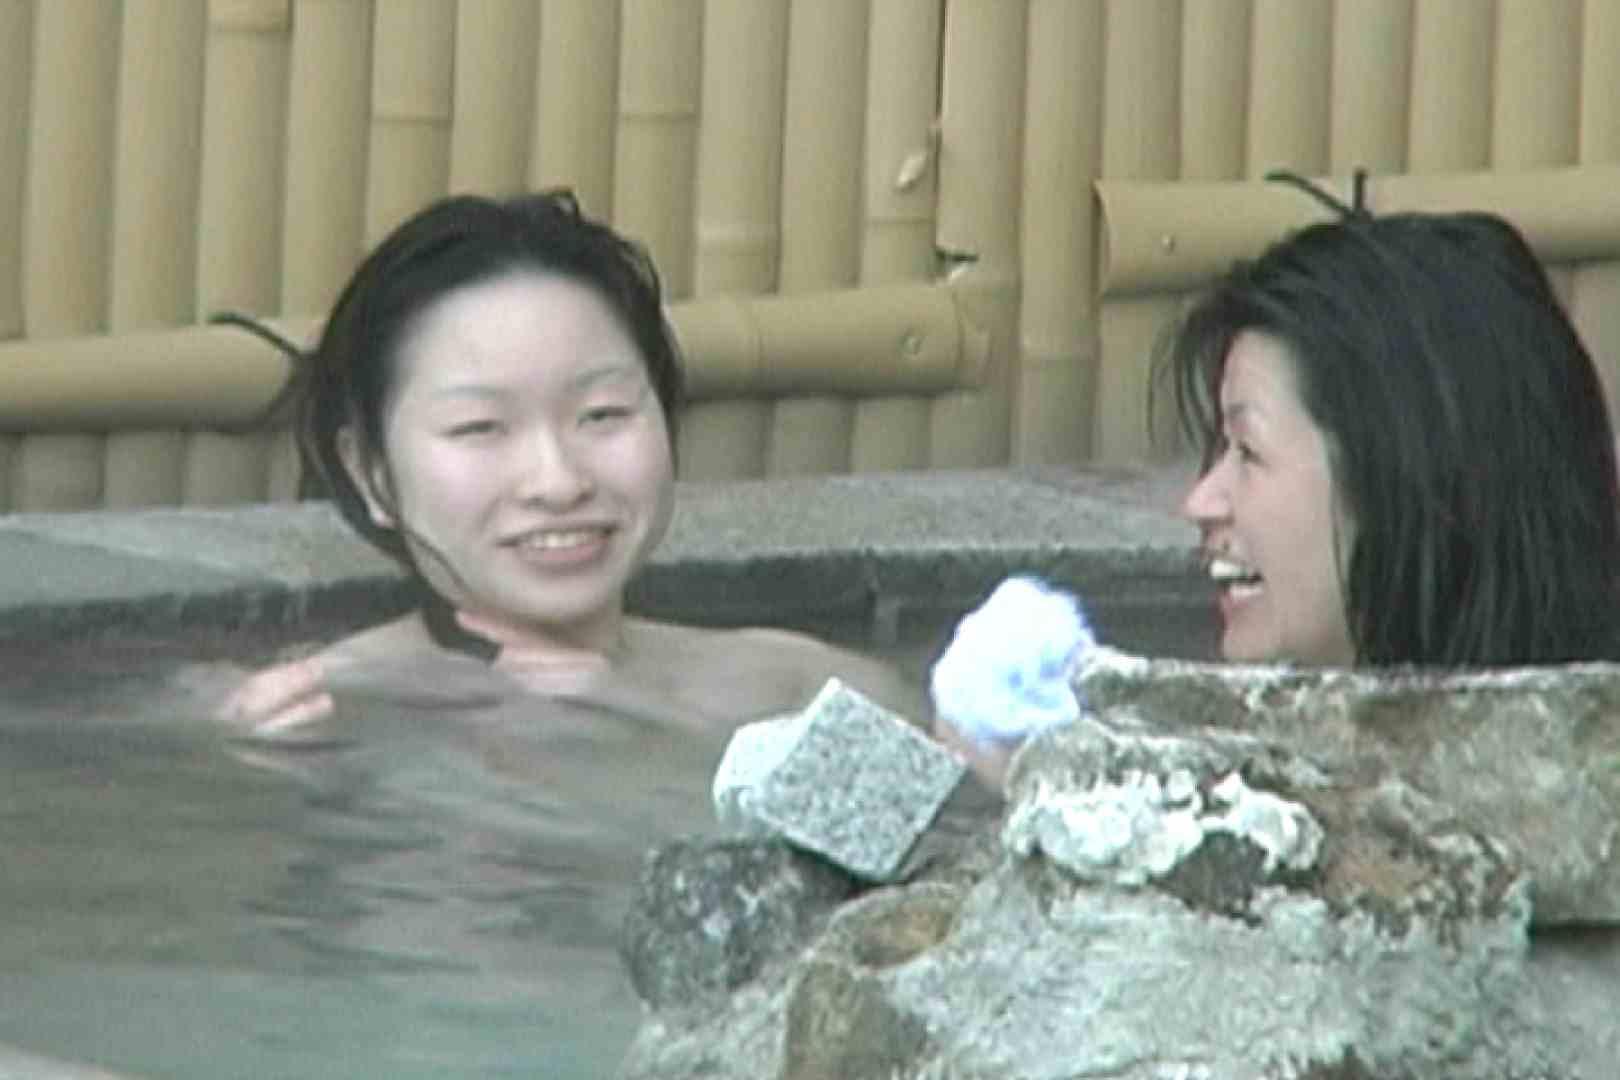 Aquaな露天風呂Vol.595 綺麗なOLたち エロ無料画像 112枚 92